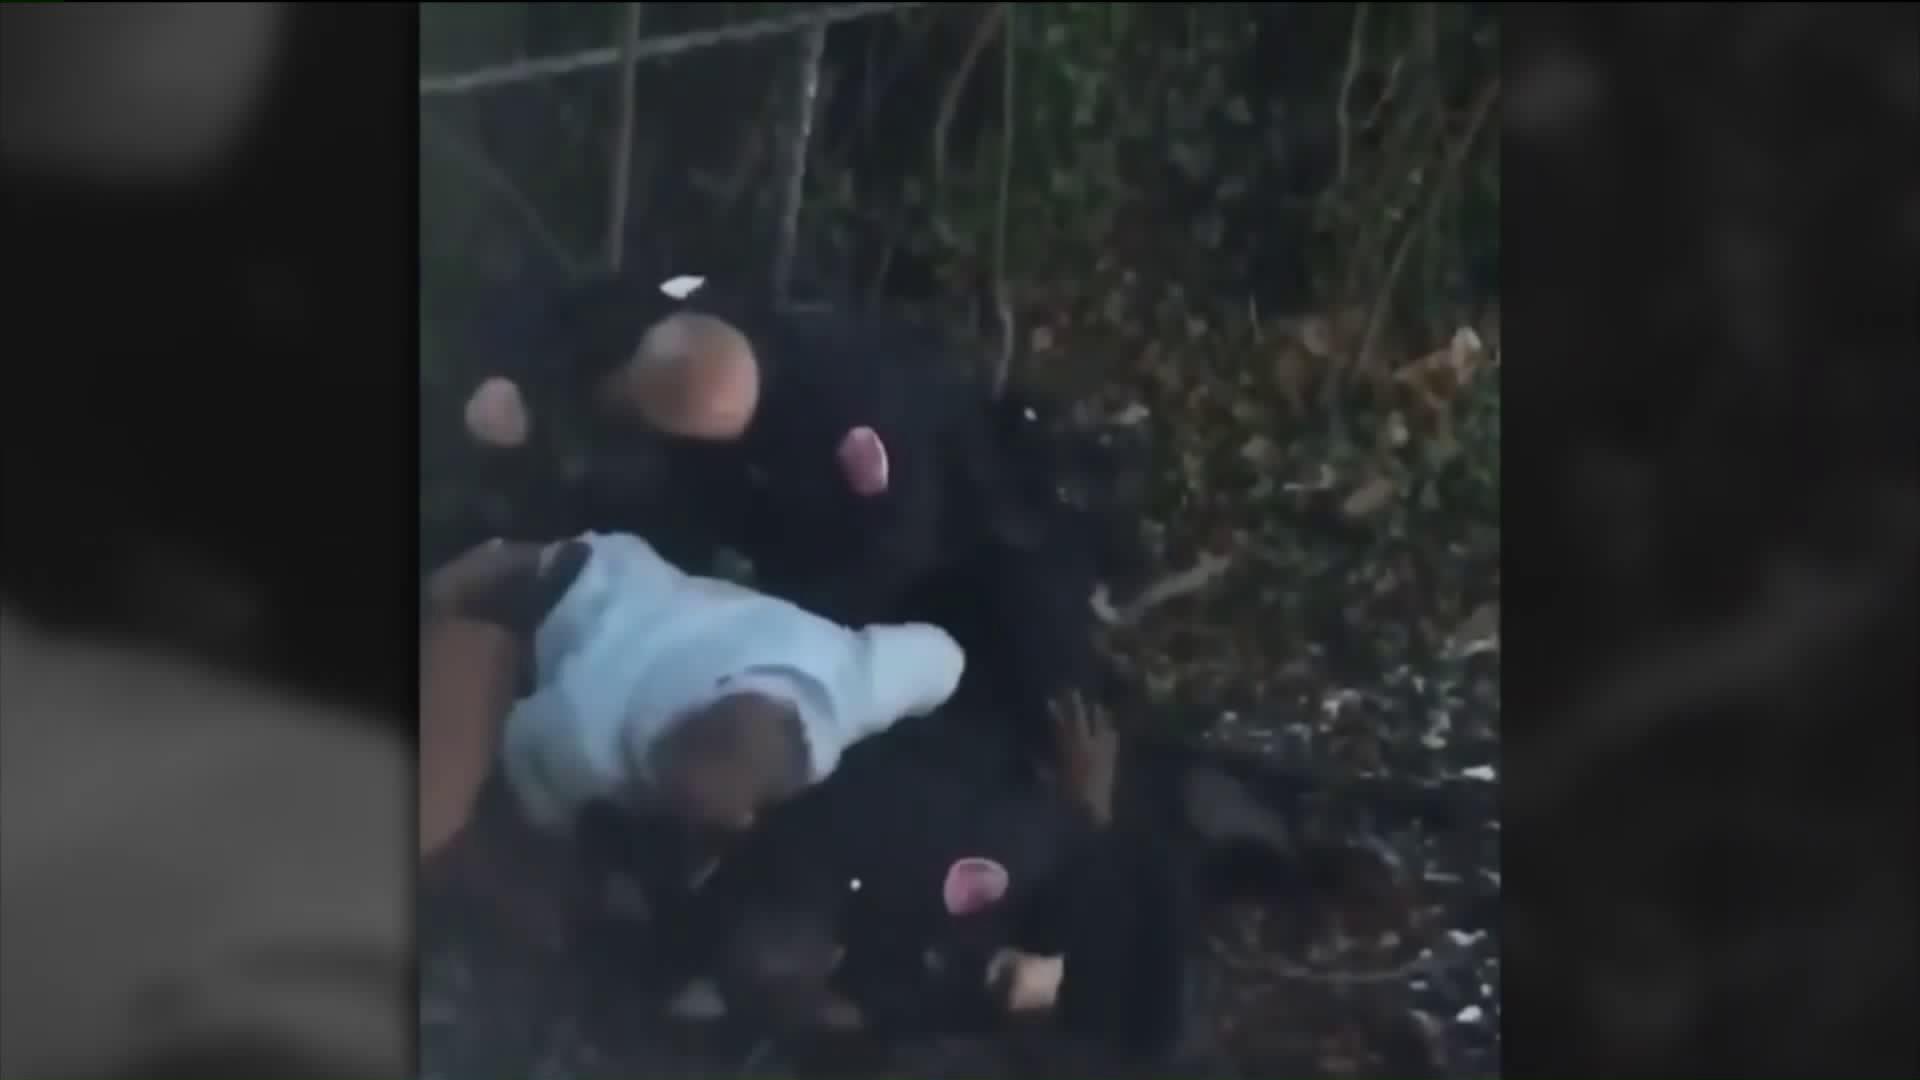 Aggressive arrest in Freeport, Long Island sparks outrage